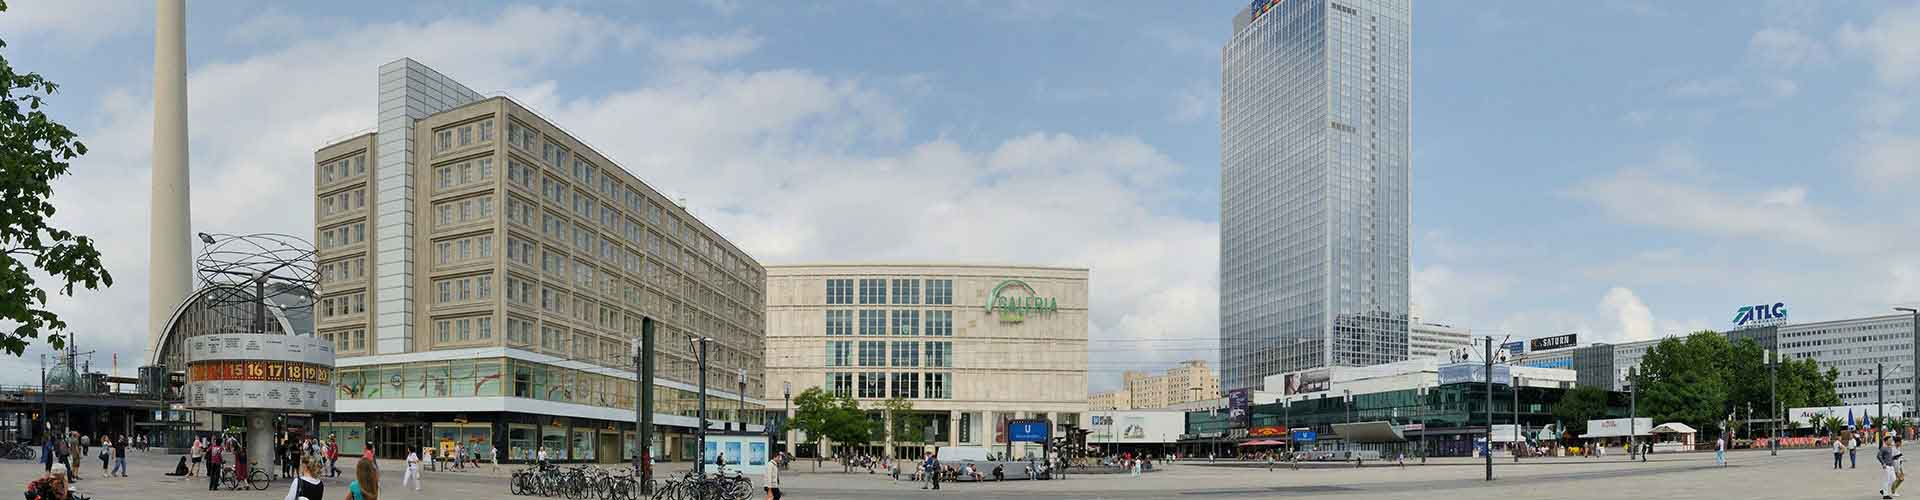 Berlín - Albergues cerca a Alexanderplatz. Mapas de Berlín, Fotos y Comentarios para cada Albergue en Berlín.